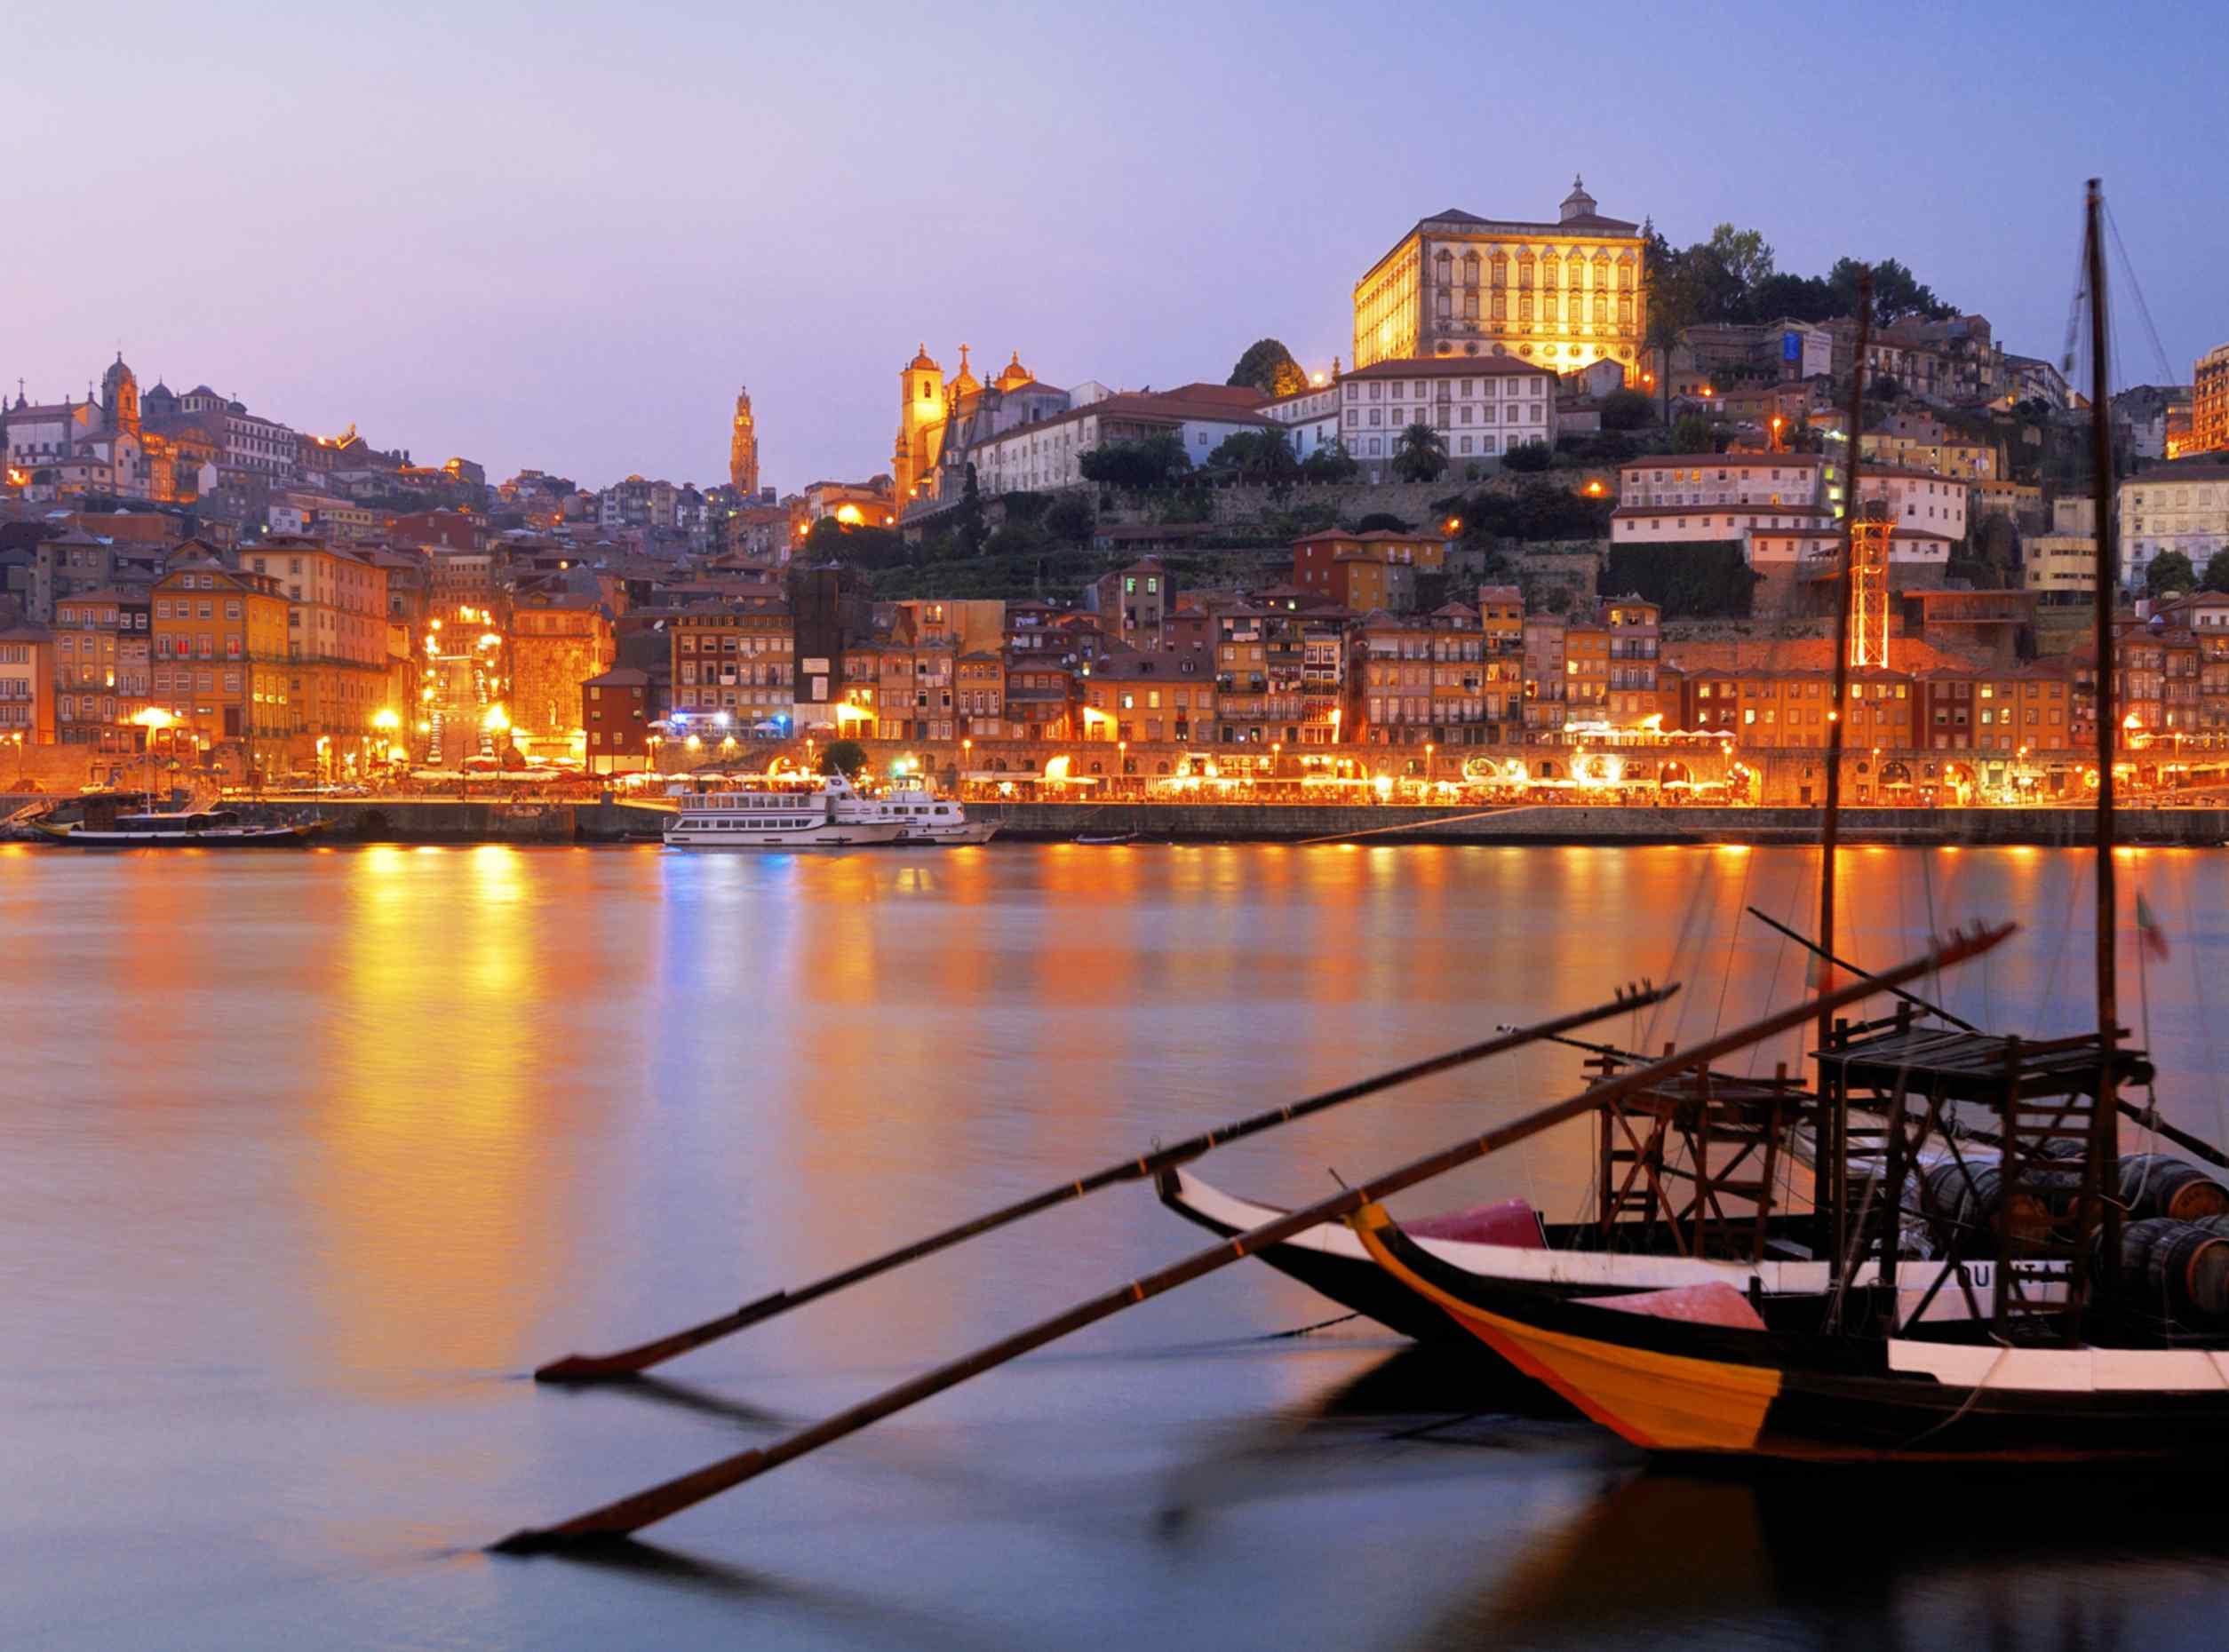 также порту португалия фото сняла себя